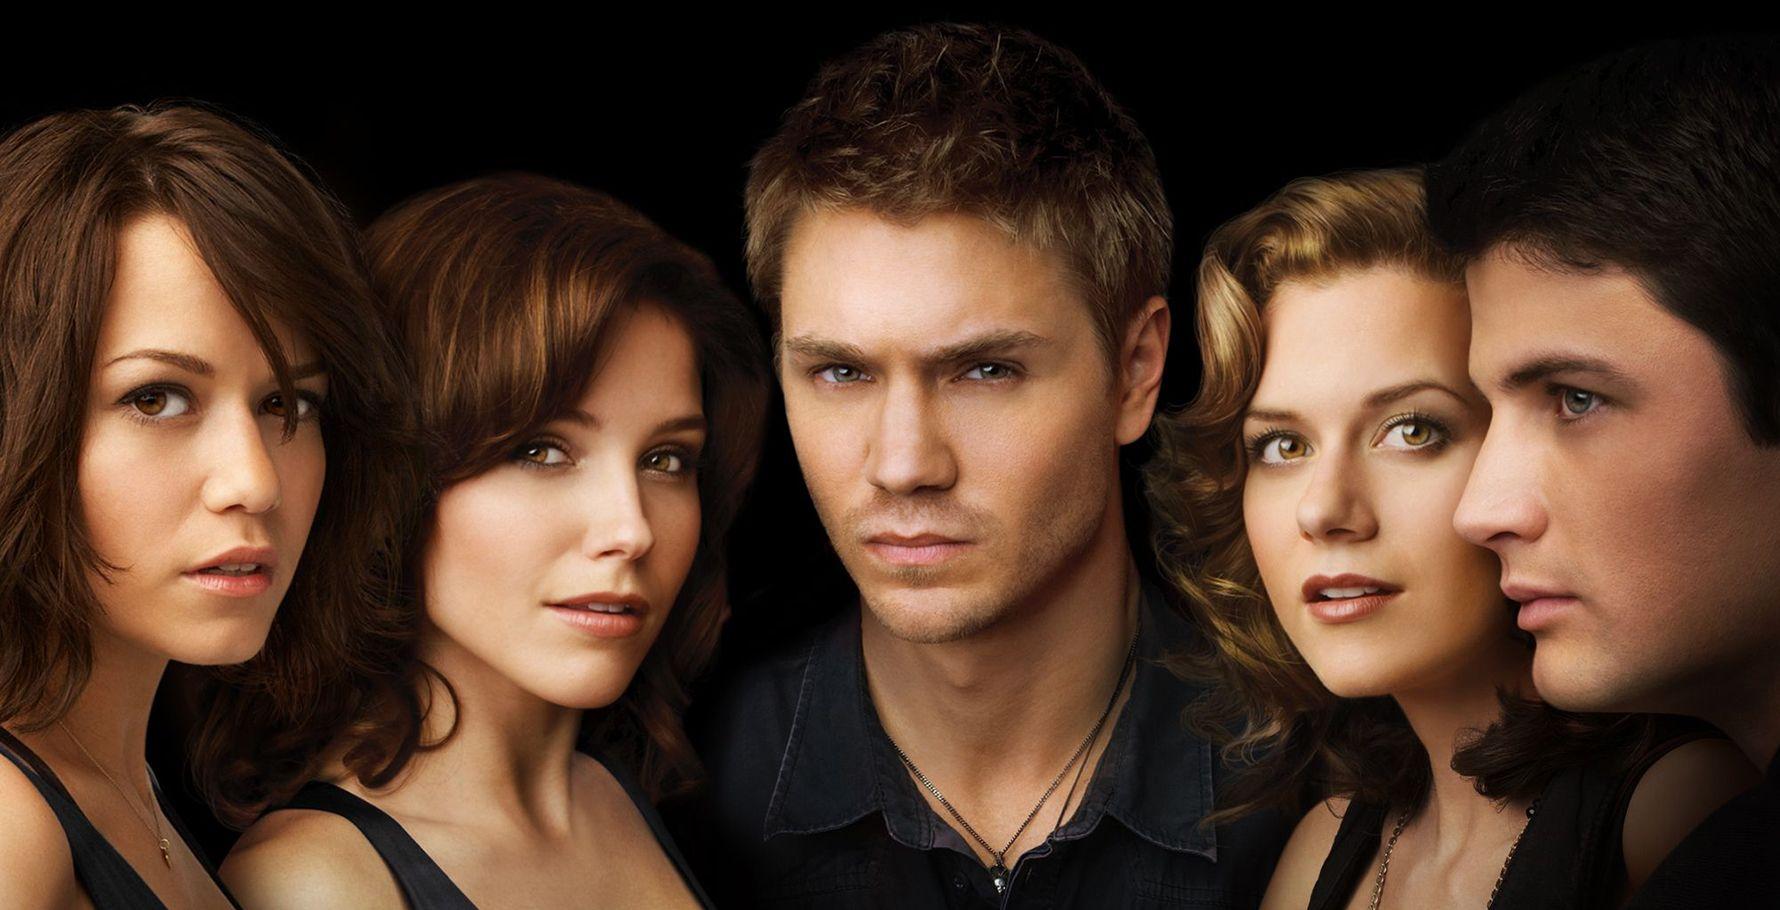 One Tree Hill Sezonul 2 Episodul 12 Online Subtitrat in Romana HD | Seriale Online